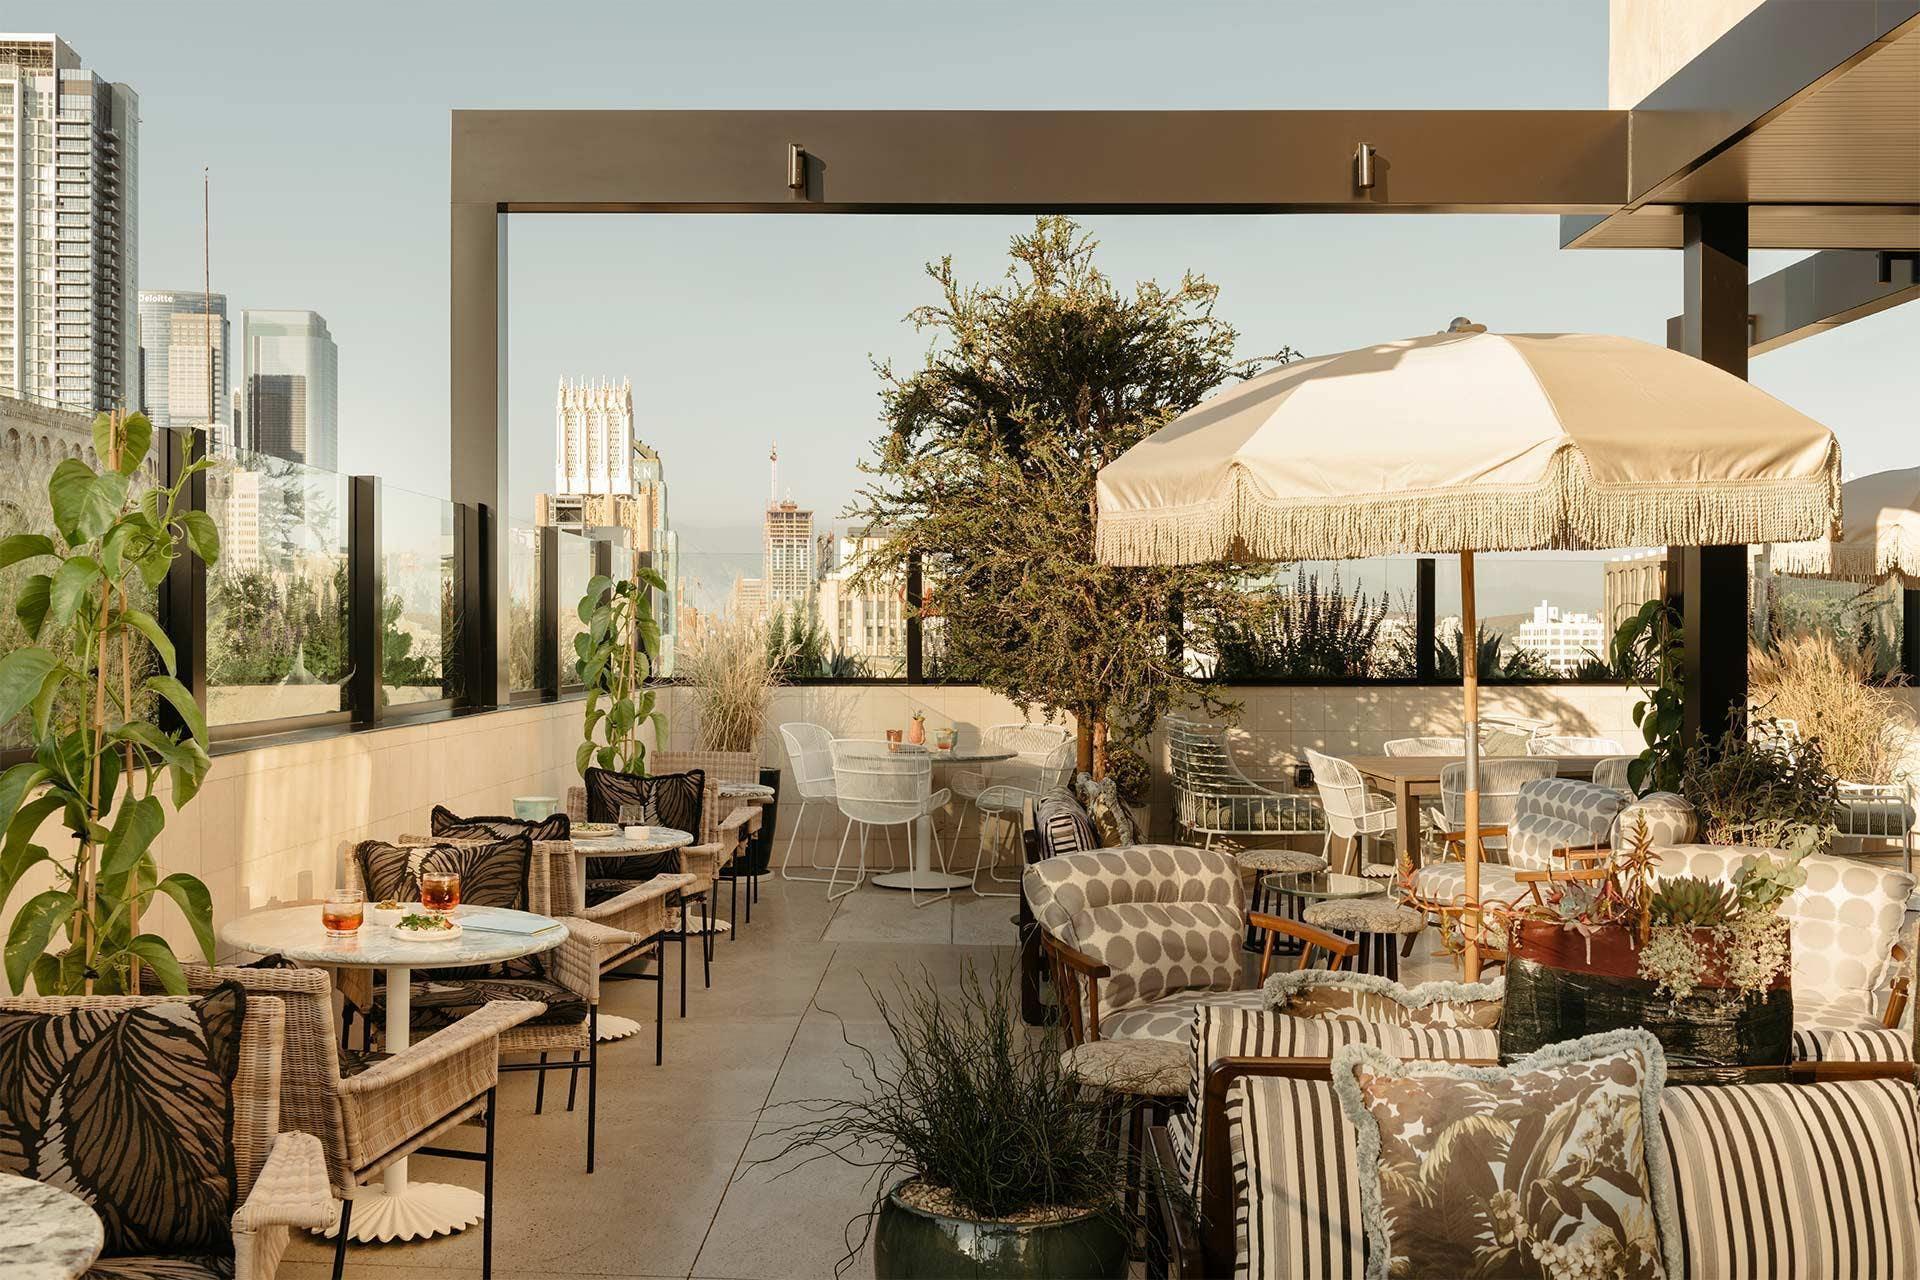 Pilot Bar & Lounge at The Hoxton Downtown LA